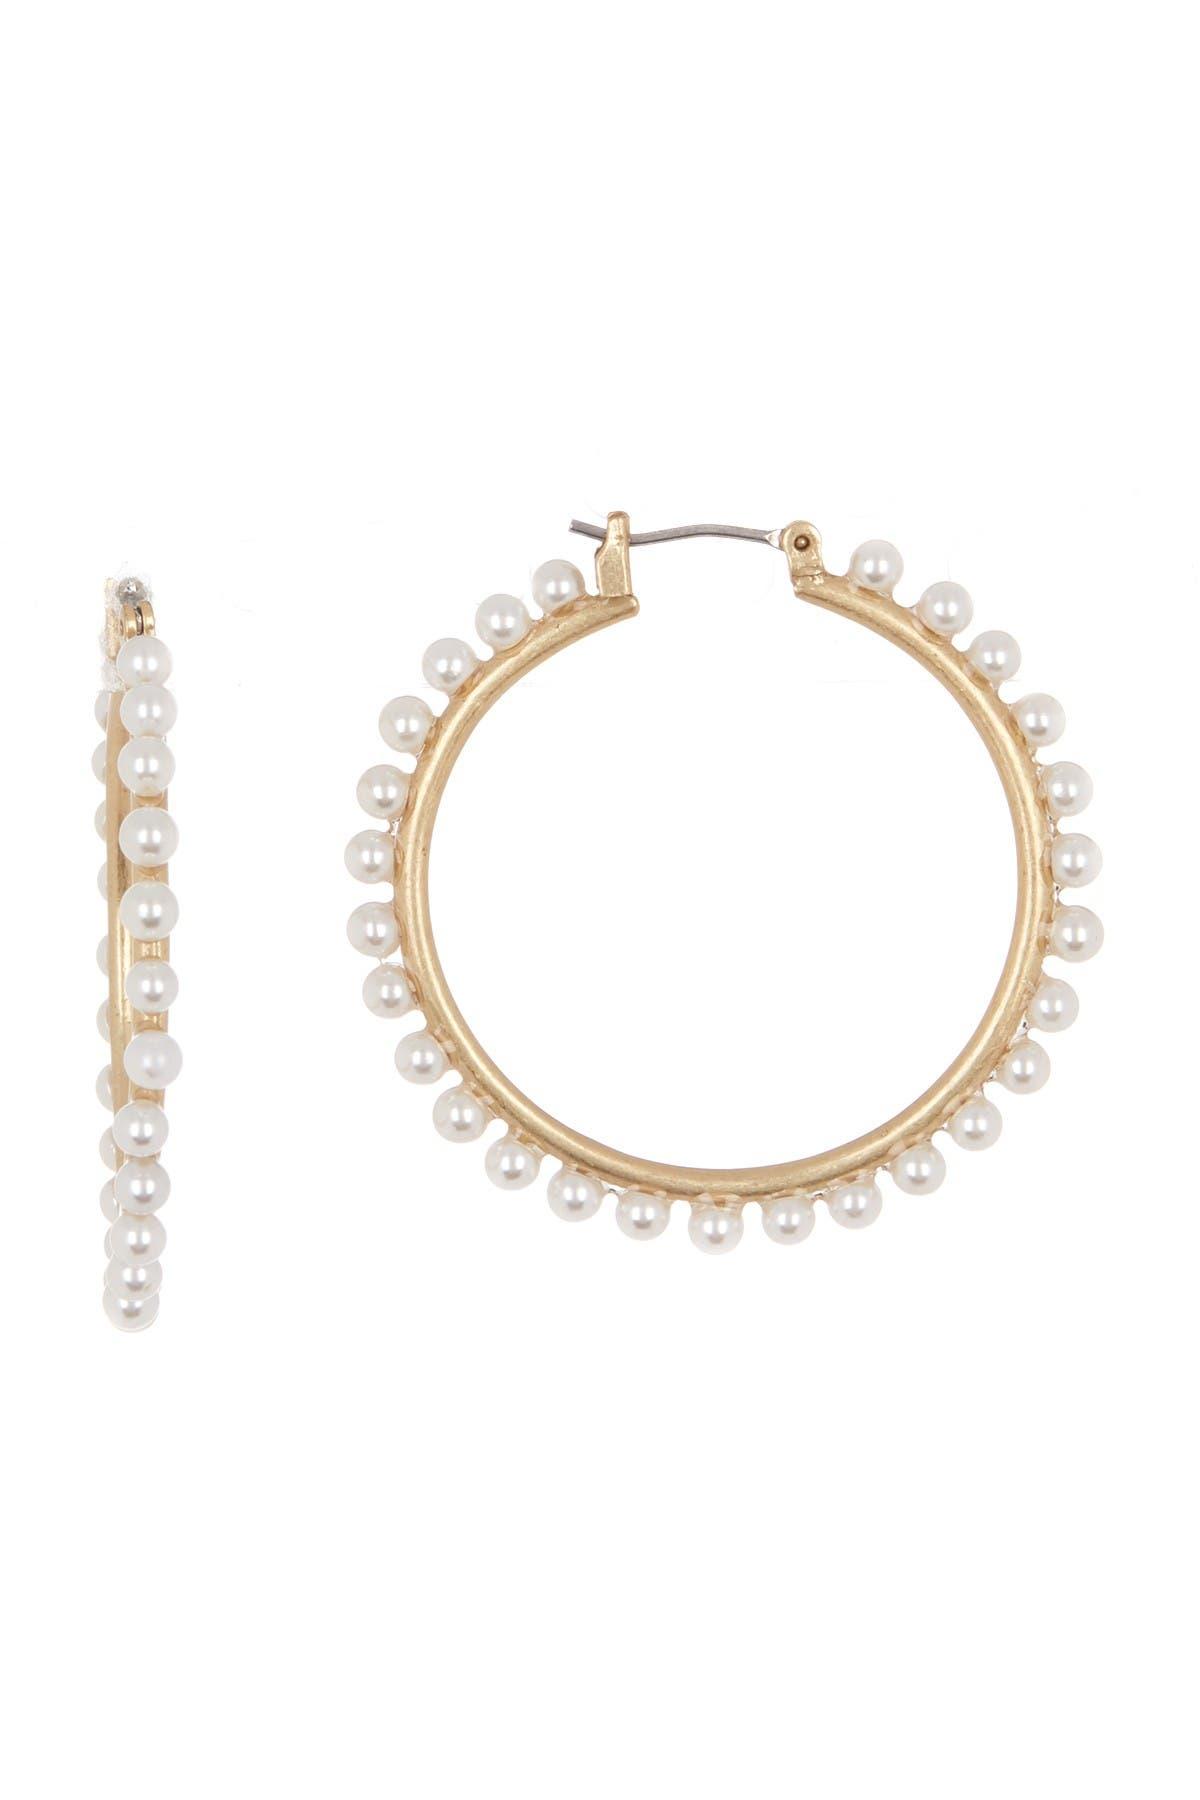 Image of Lucky Brand Imitation Pearl Beaded Hoop Earrings